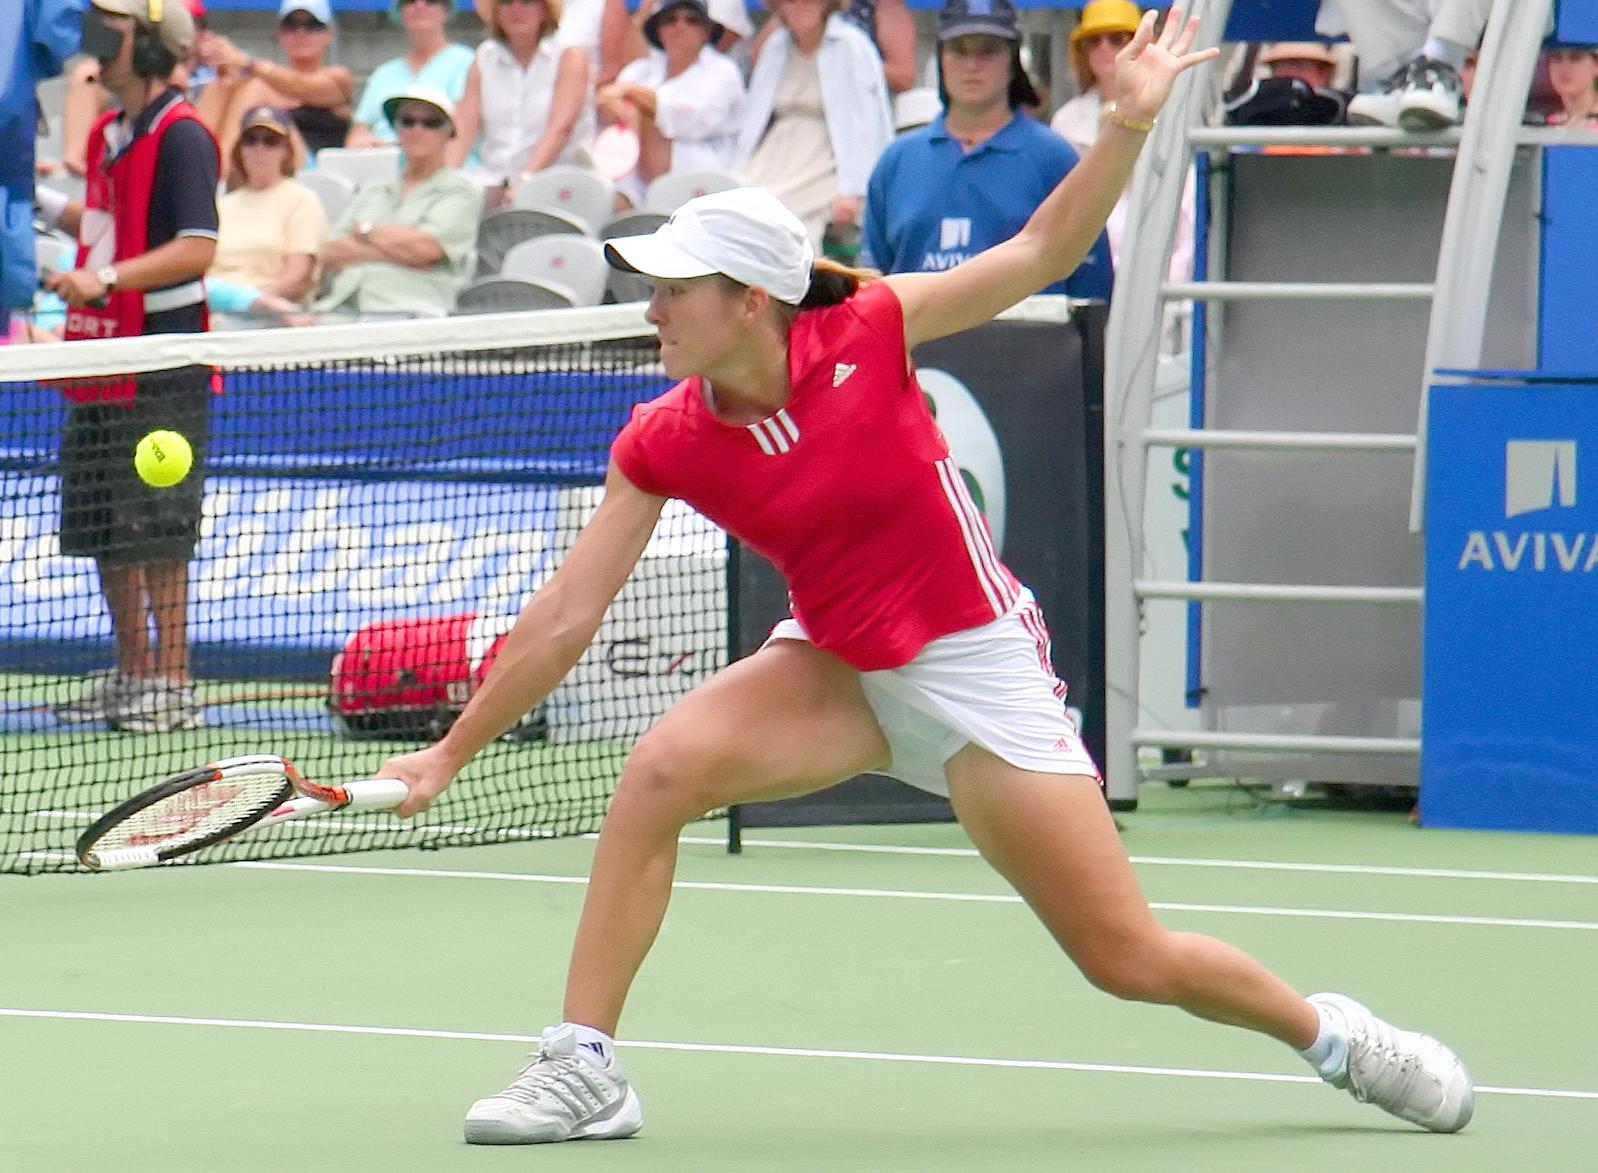 Tennis Star Justine Henin